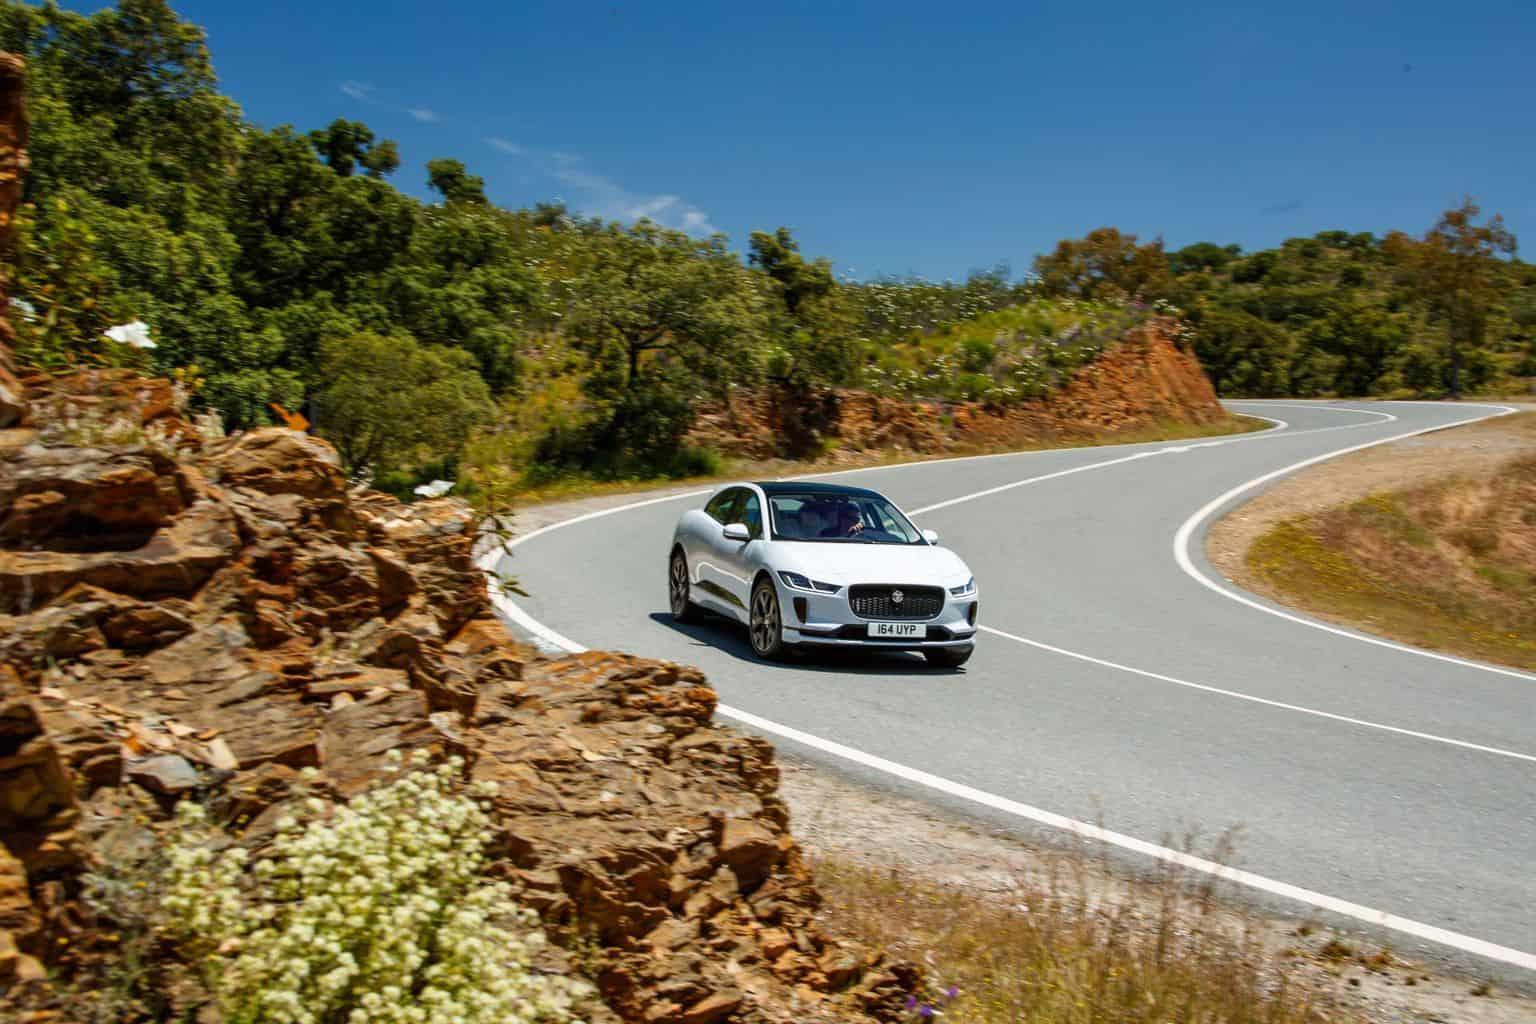 Erfahrungen aus dem Alltag eines Jaguar I-PACE-Fahrers